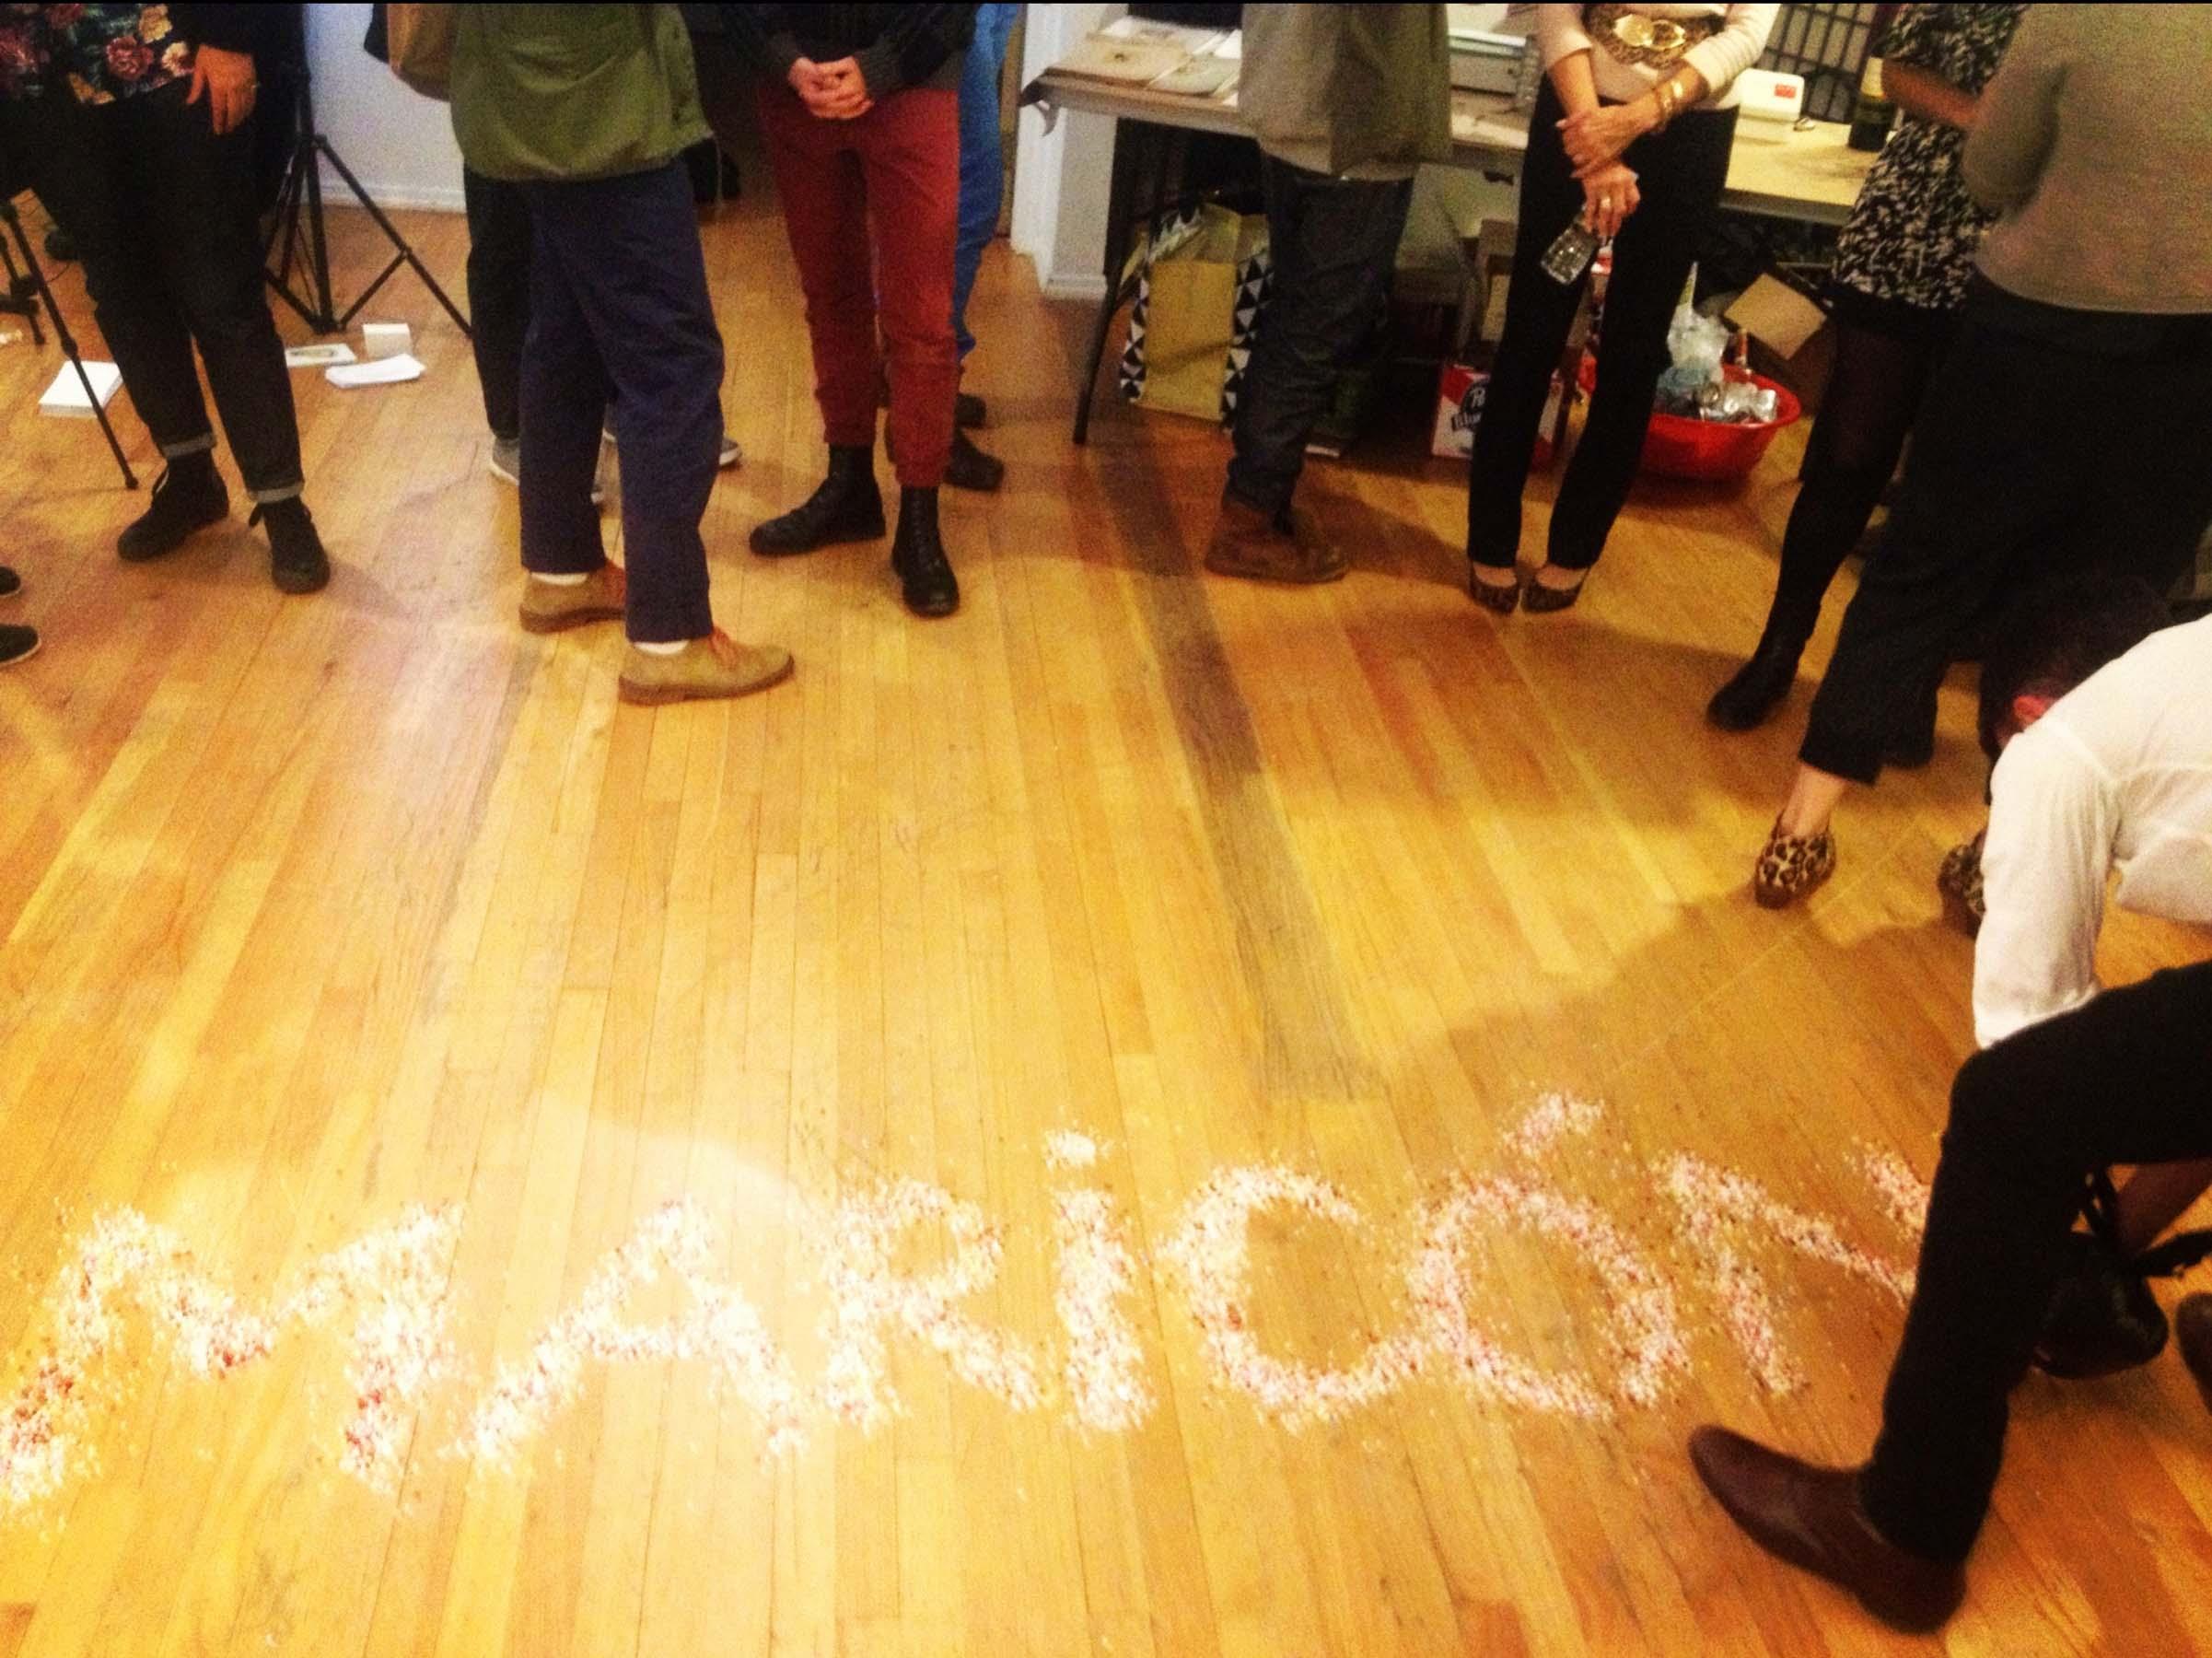 2012-10-16-Maricon.jpg